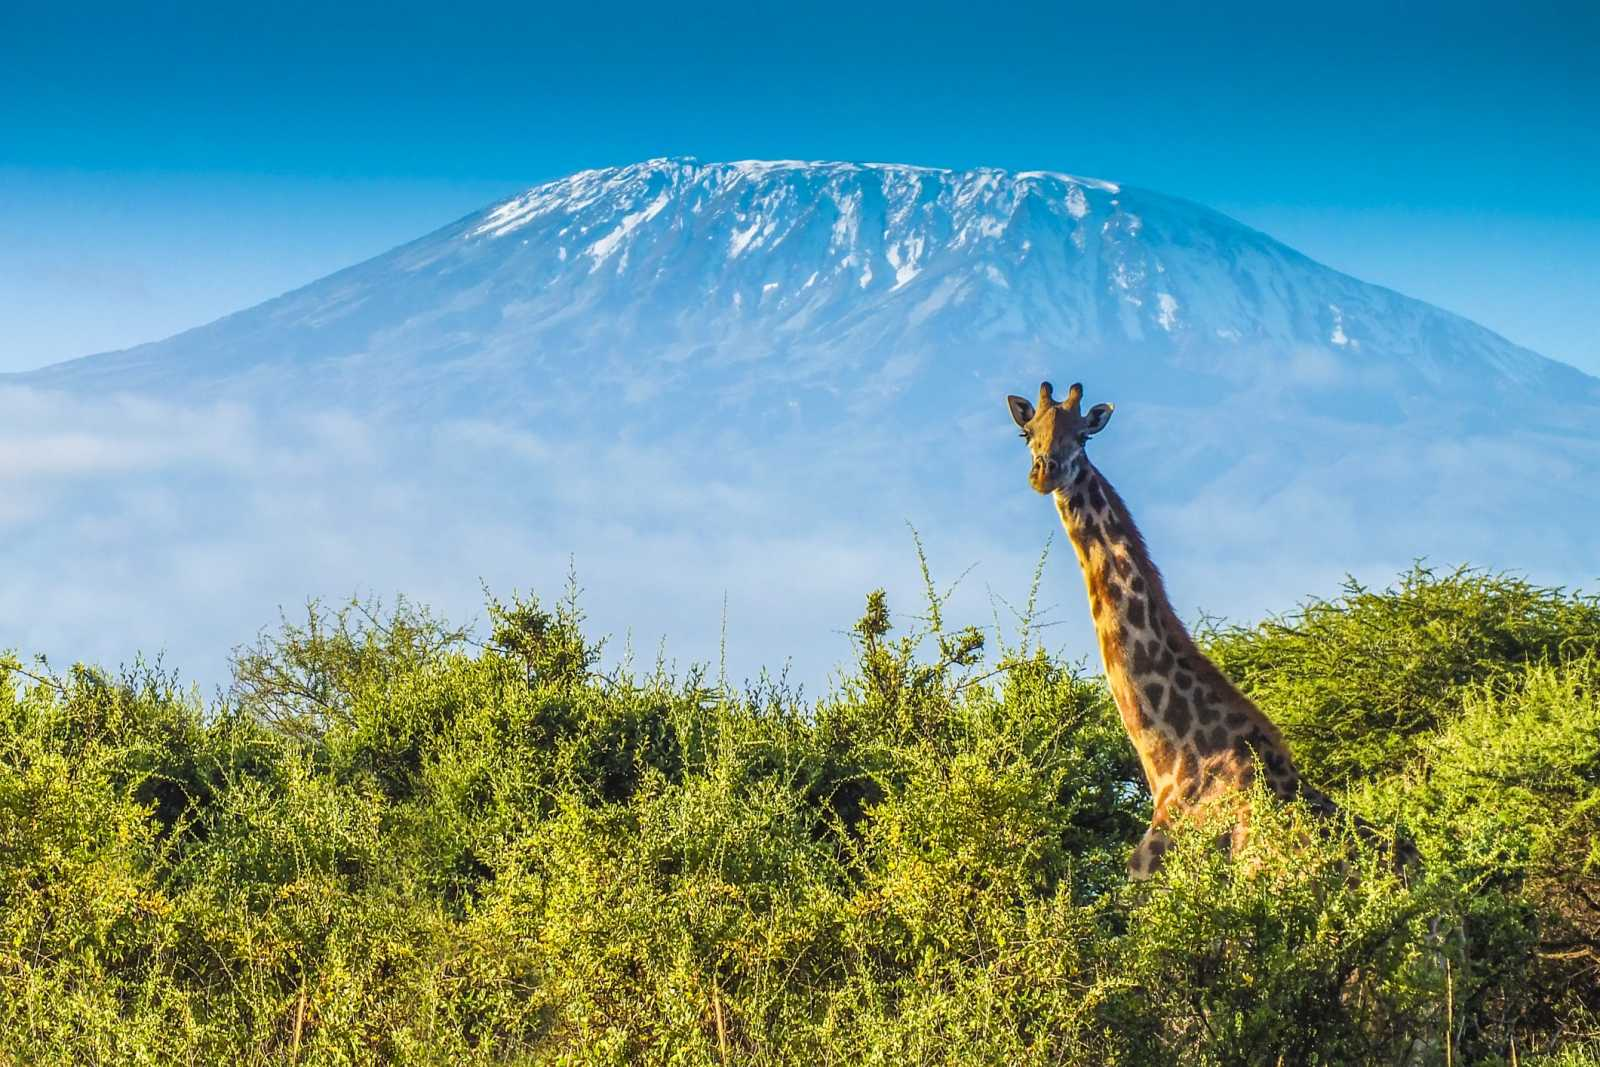 Rondreis Tanzania – Individuele Rondreizen Op Maat | Tourlane